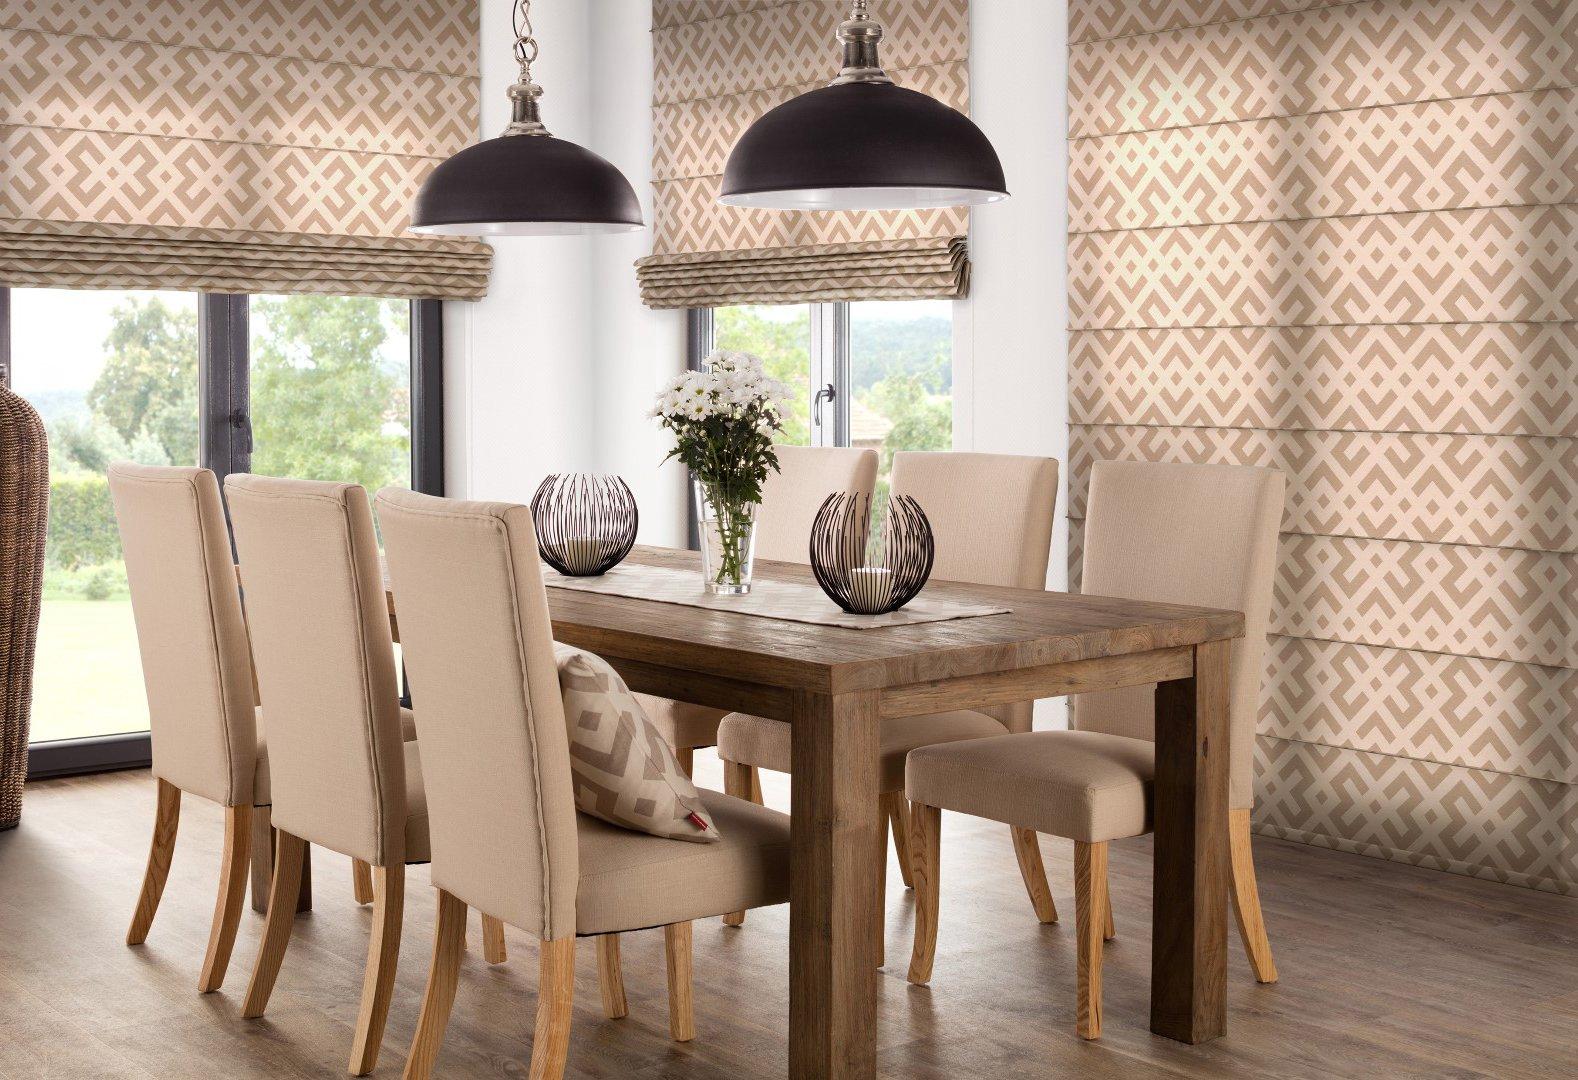 Dining room in Beige